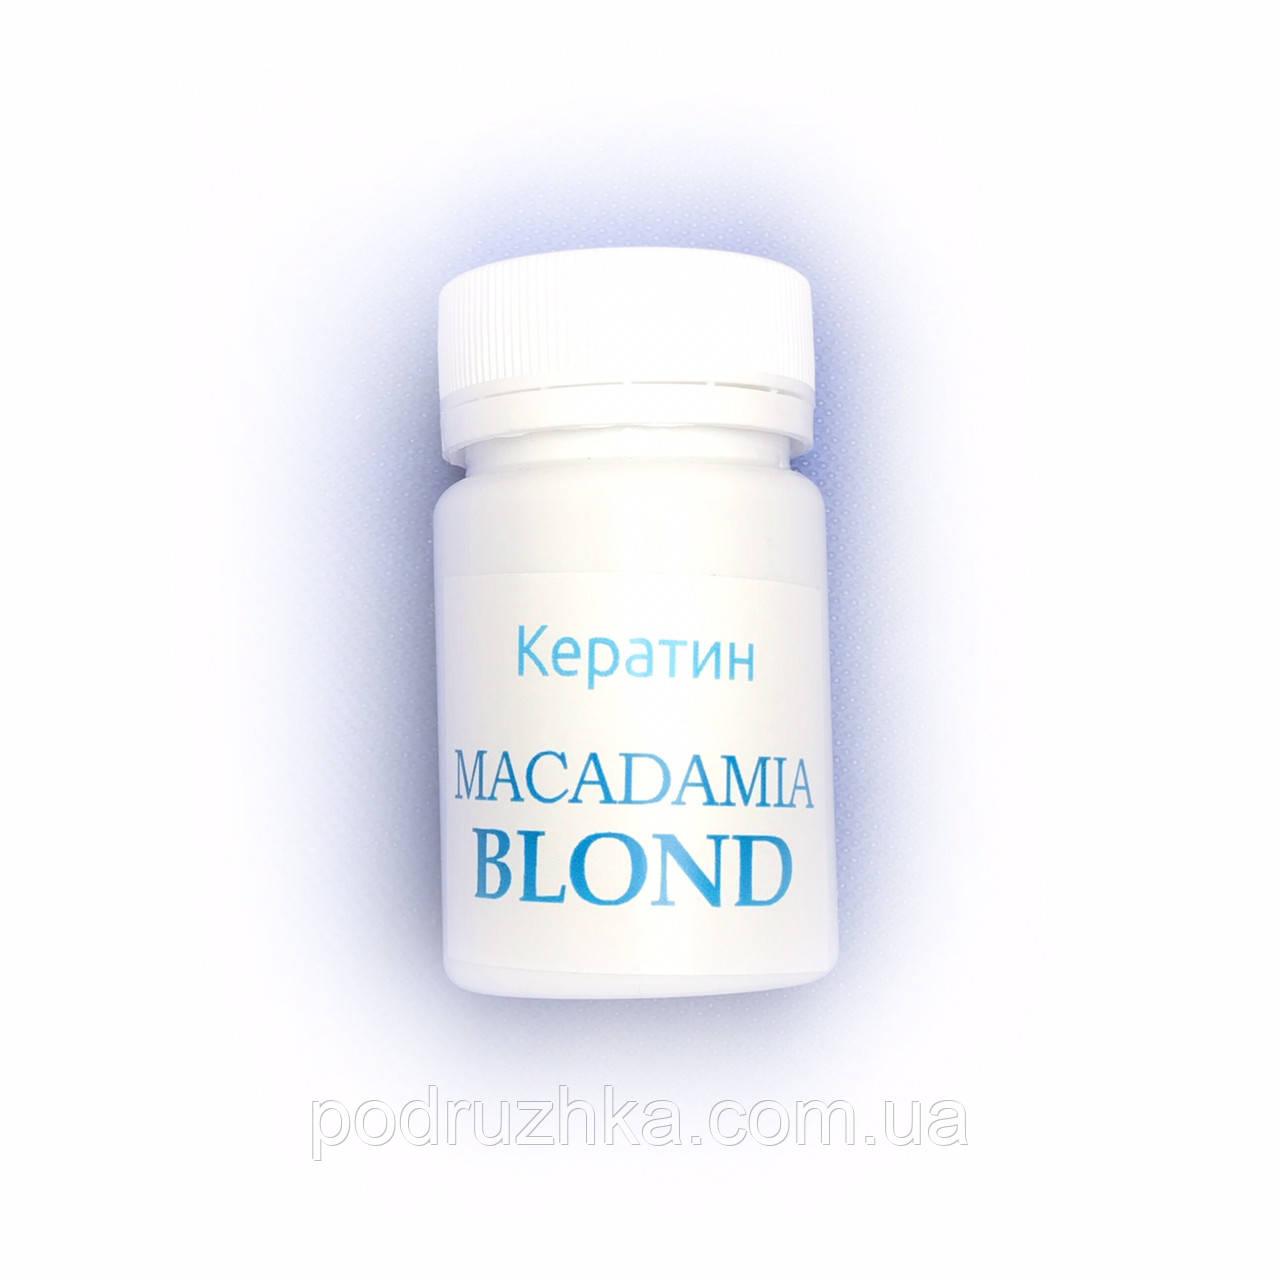 Кератин для волос Macadamia Ultimate Blond (шаг 2) 1000 г